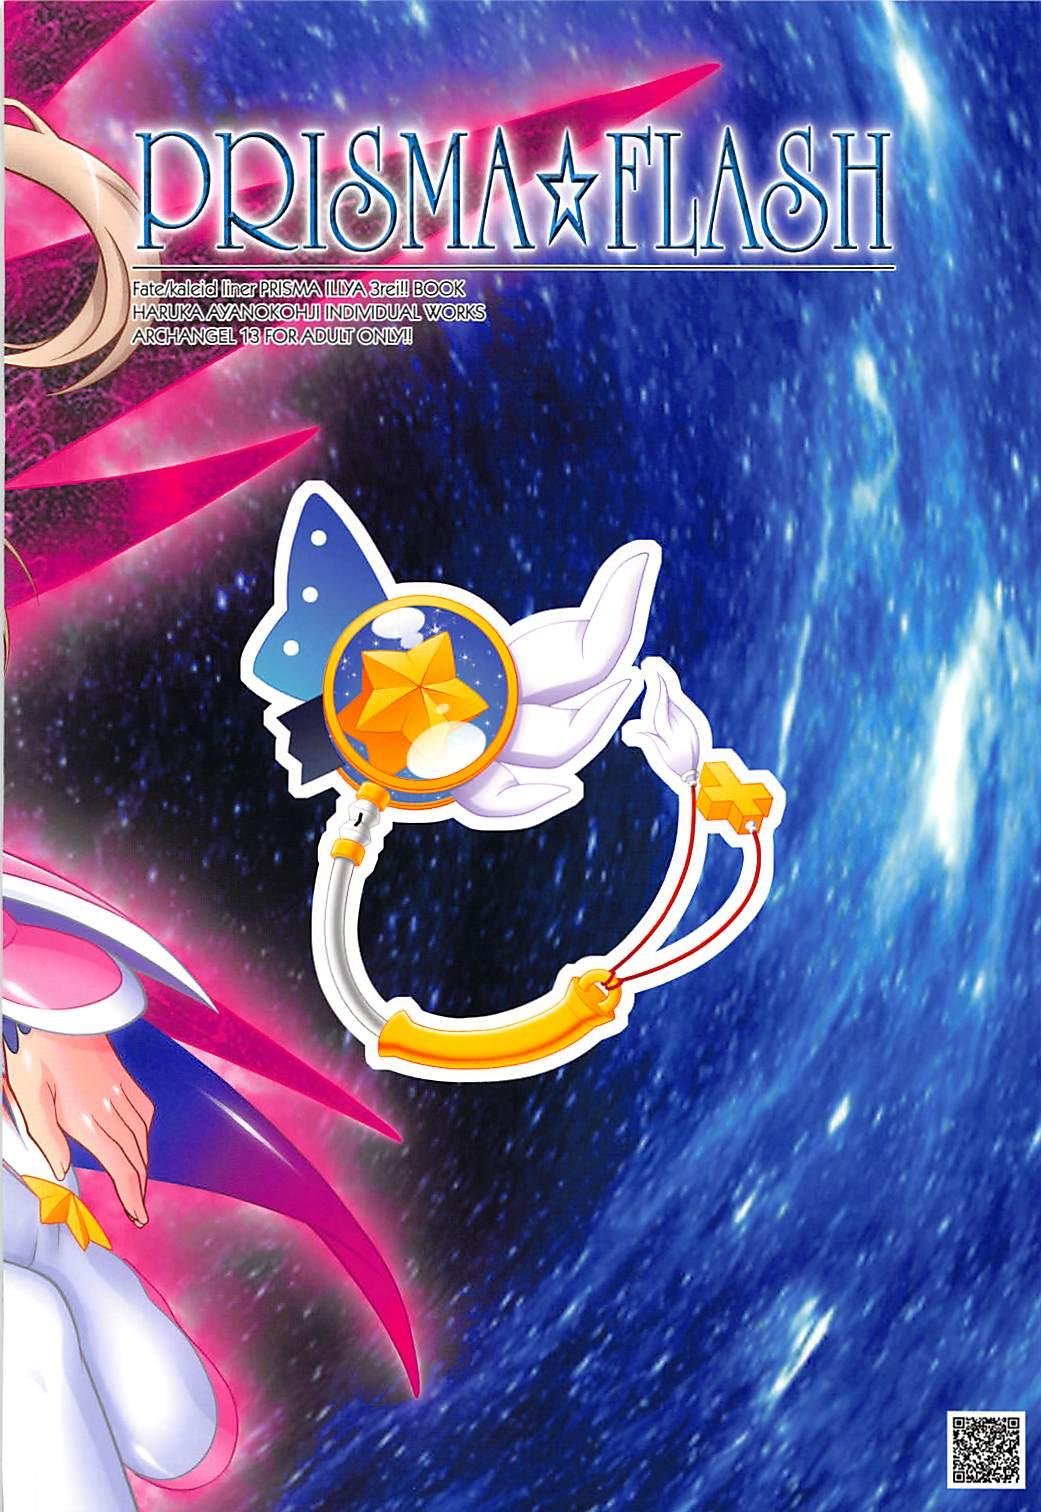 PRISMA FLASH 21